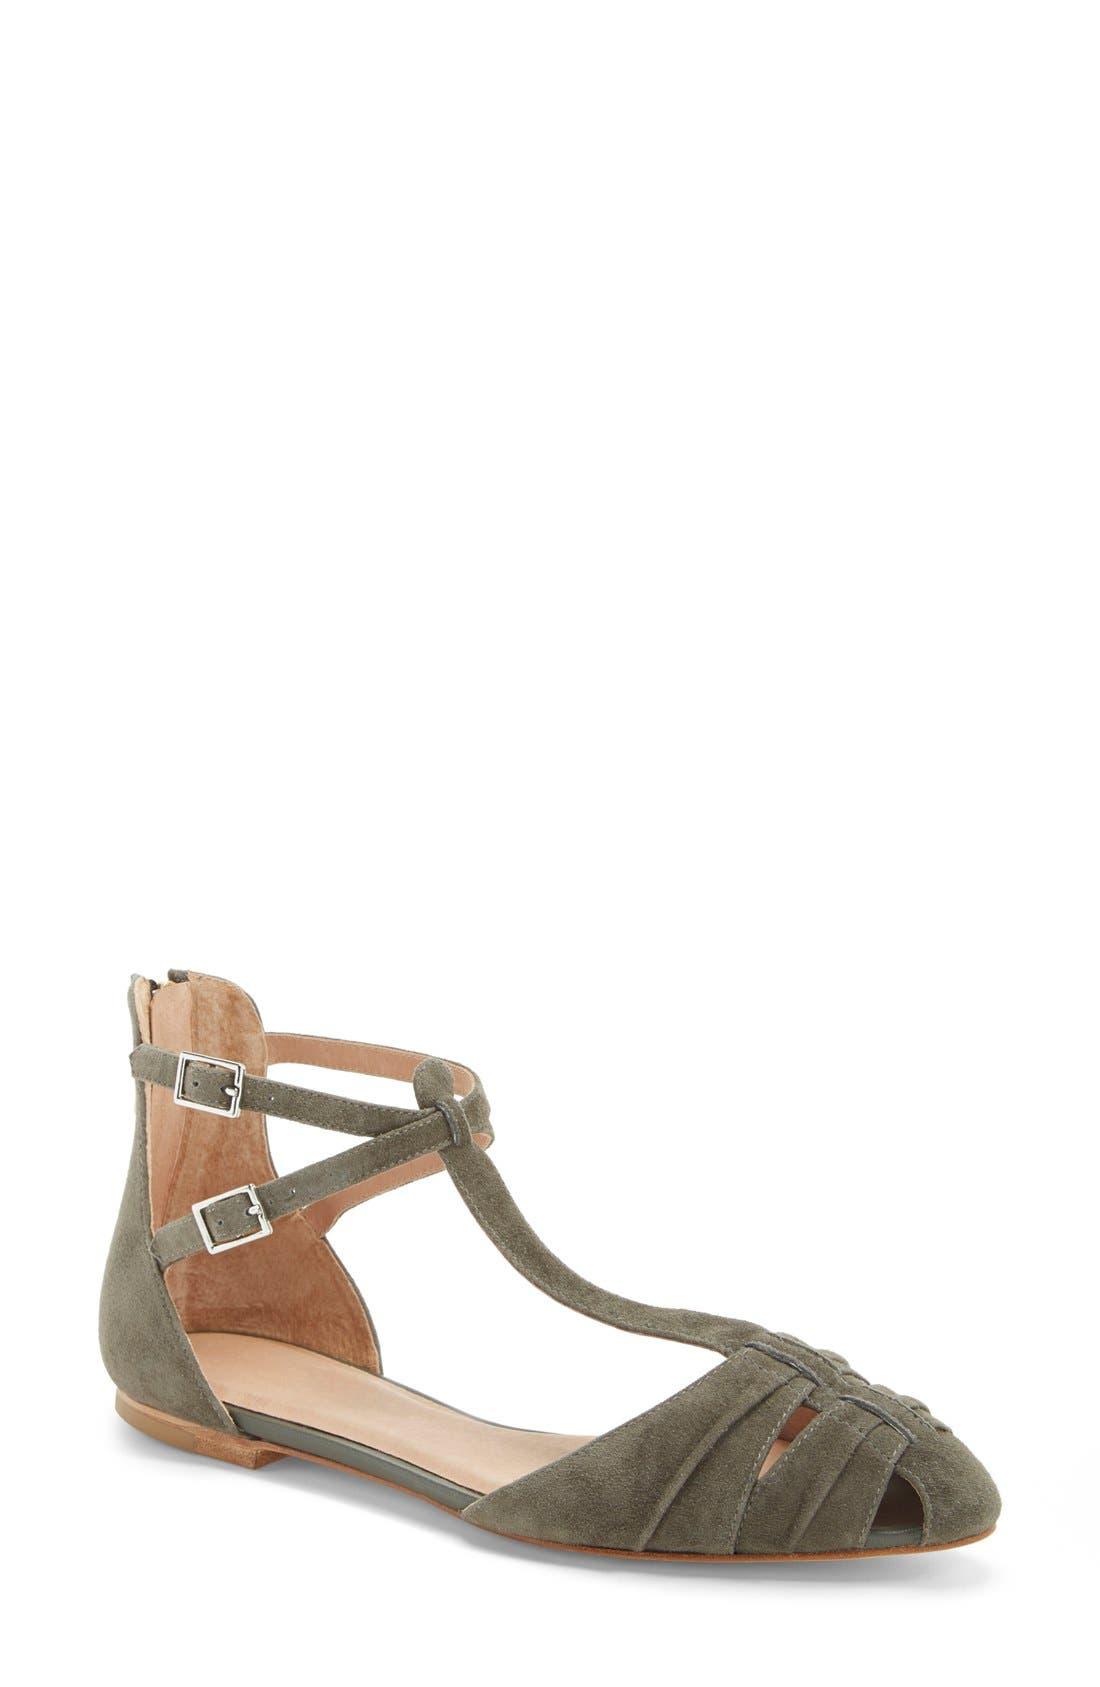 Alternate Image 1 Selected - Joie 'Agnes' T-Strap Sandal (Women)